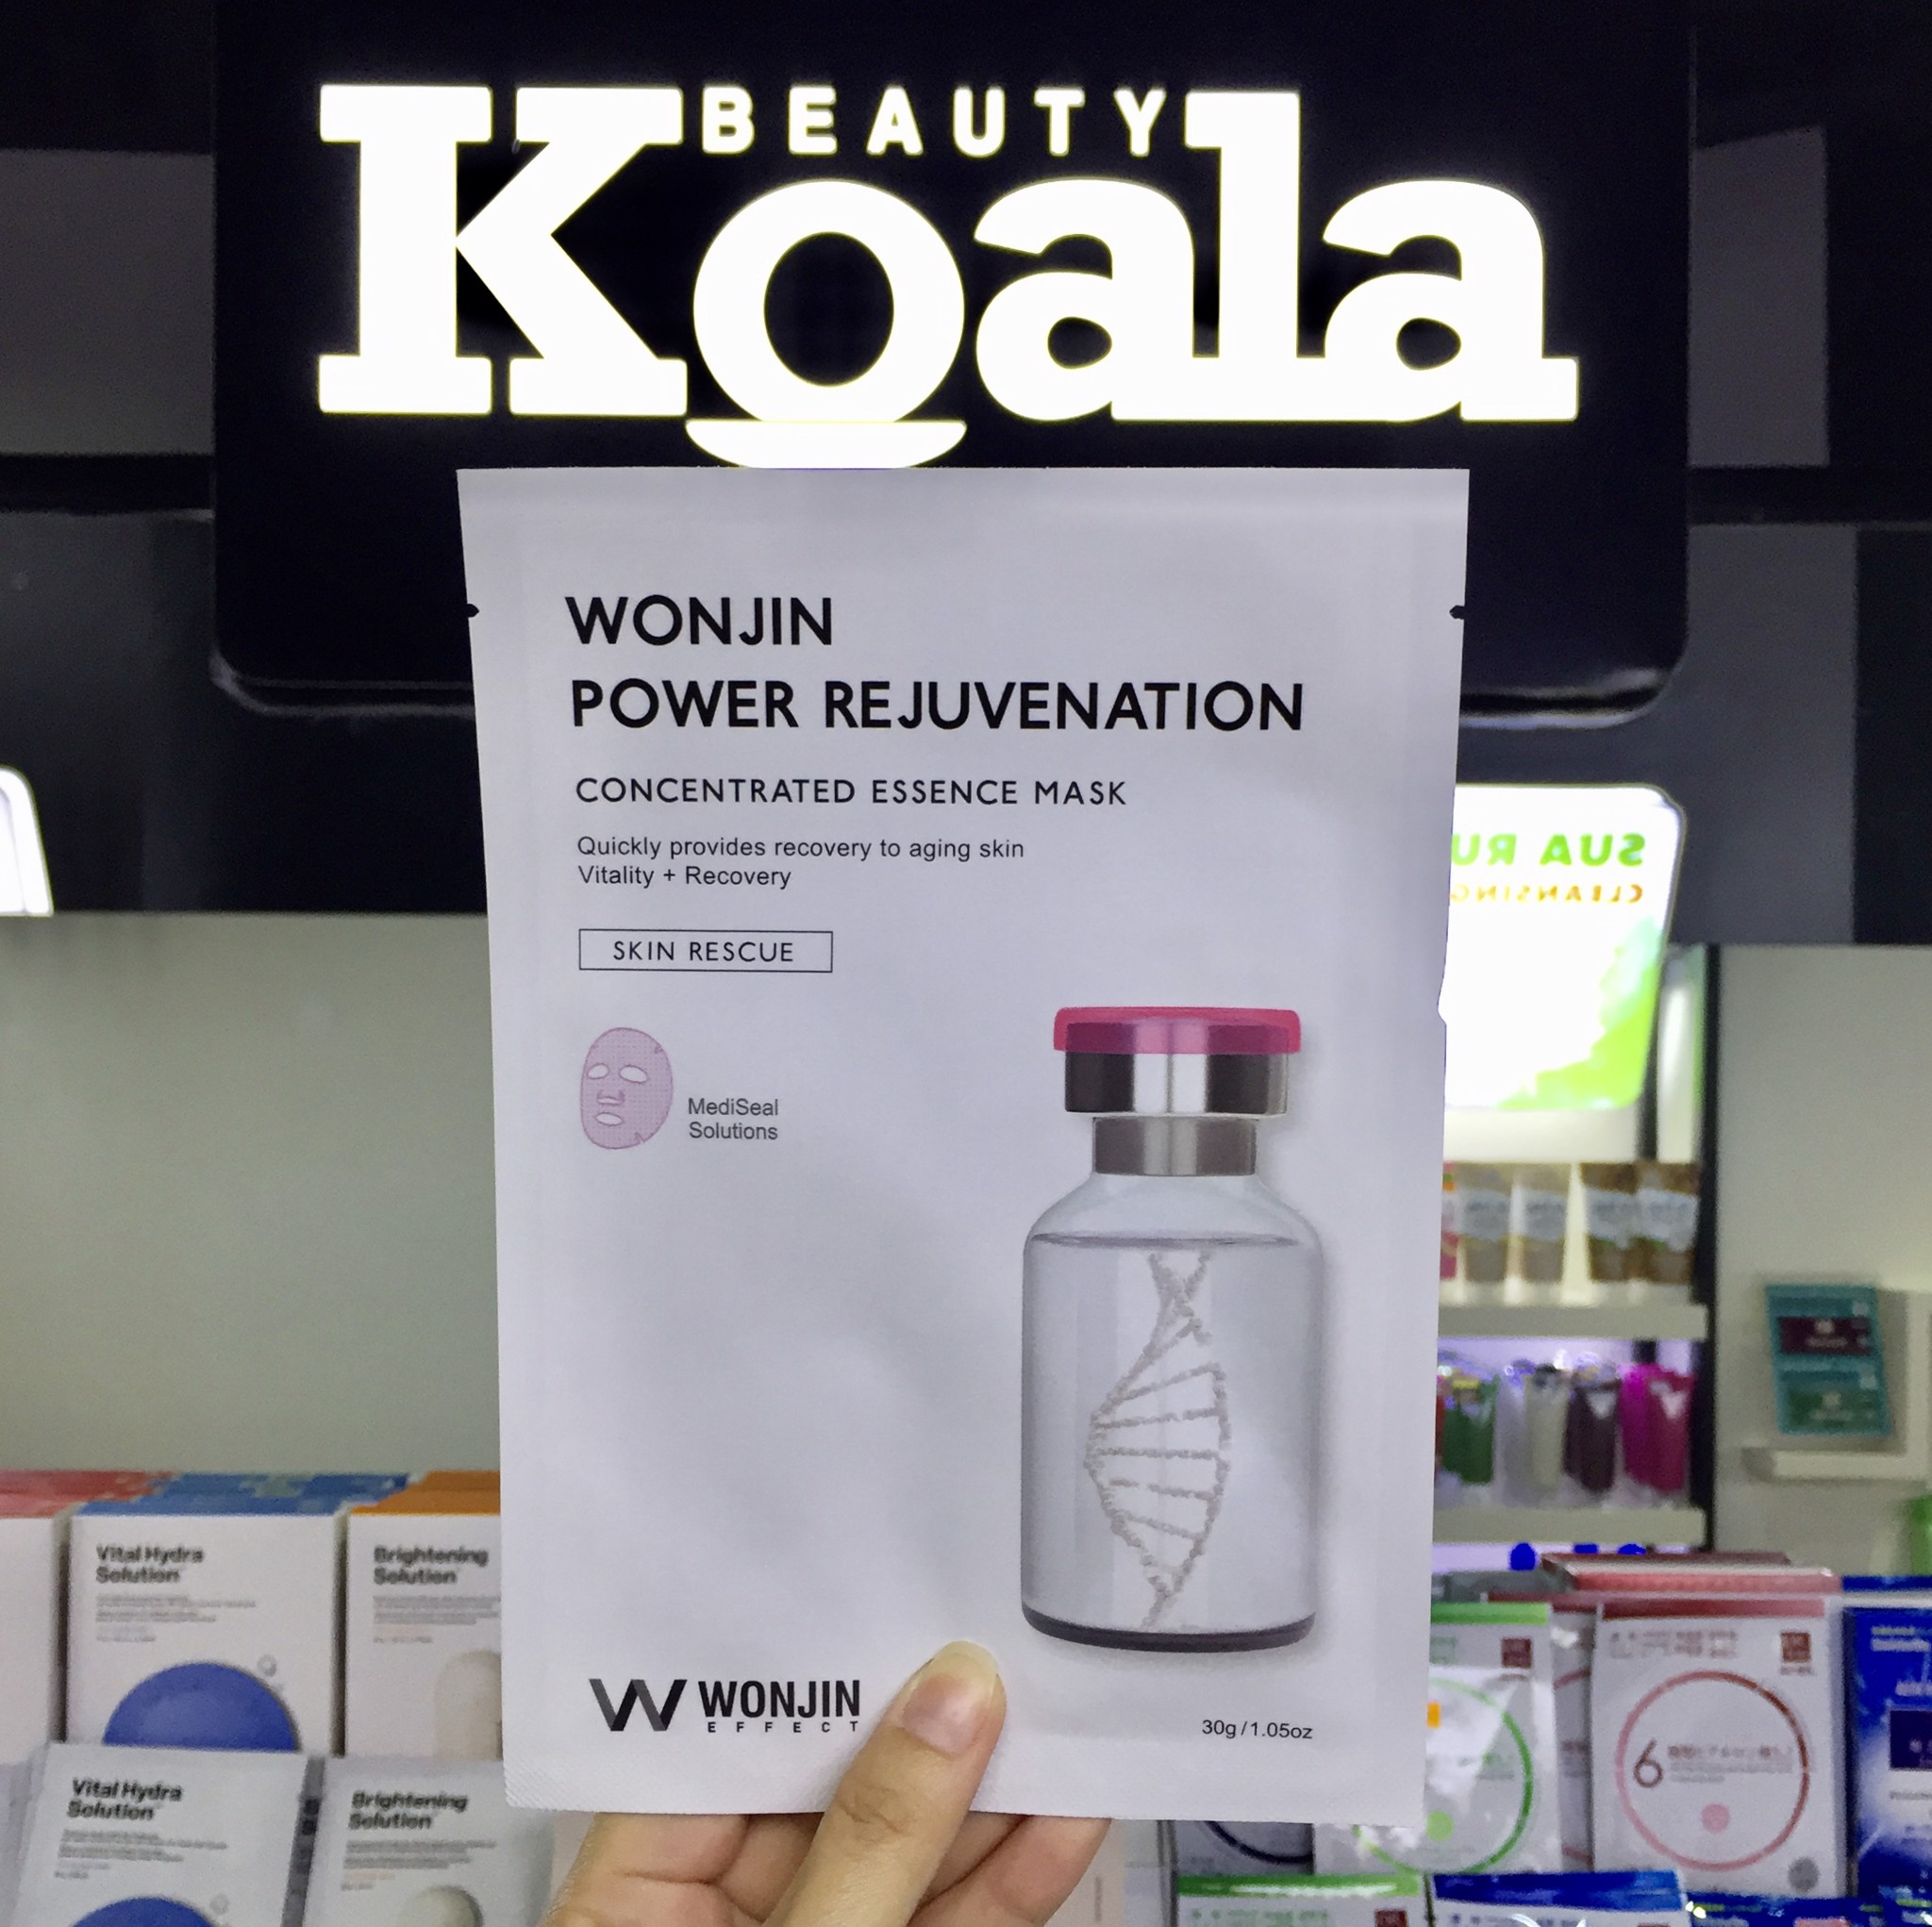 Mặt Nạ Tinh Chất Trẻ Hóa Nâng Cơ Da Wonjin Effect Power Rejuvenation Concentrated Essence Mask